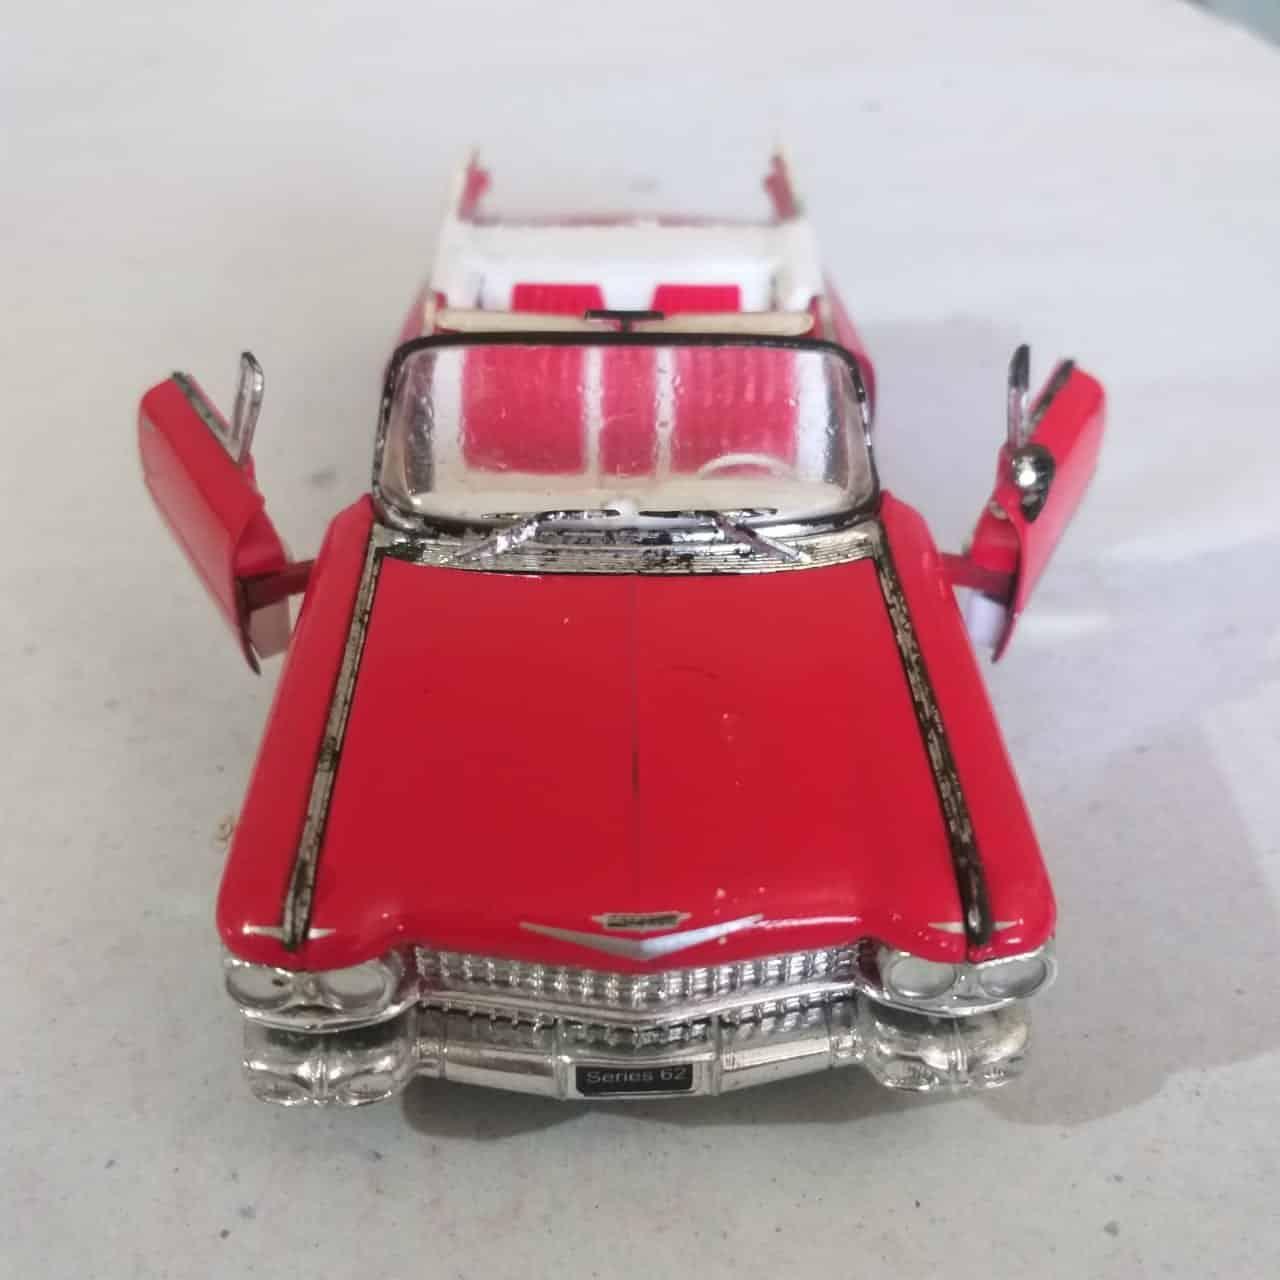 Cadillac 6 Casa do Colecionador